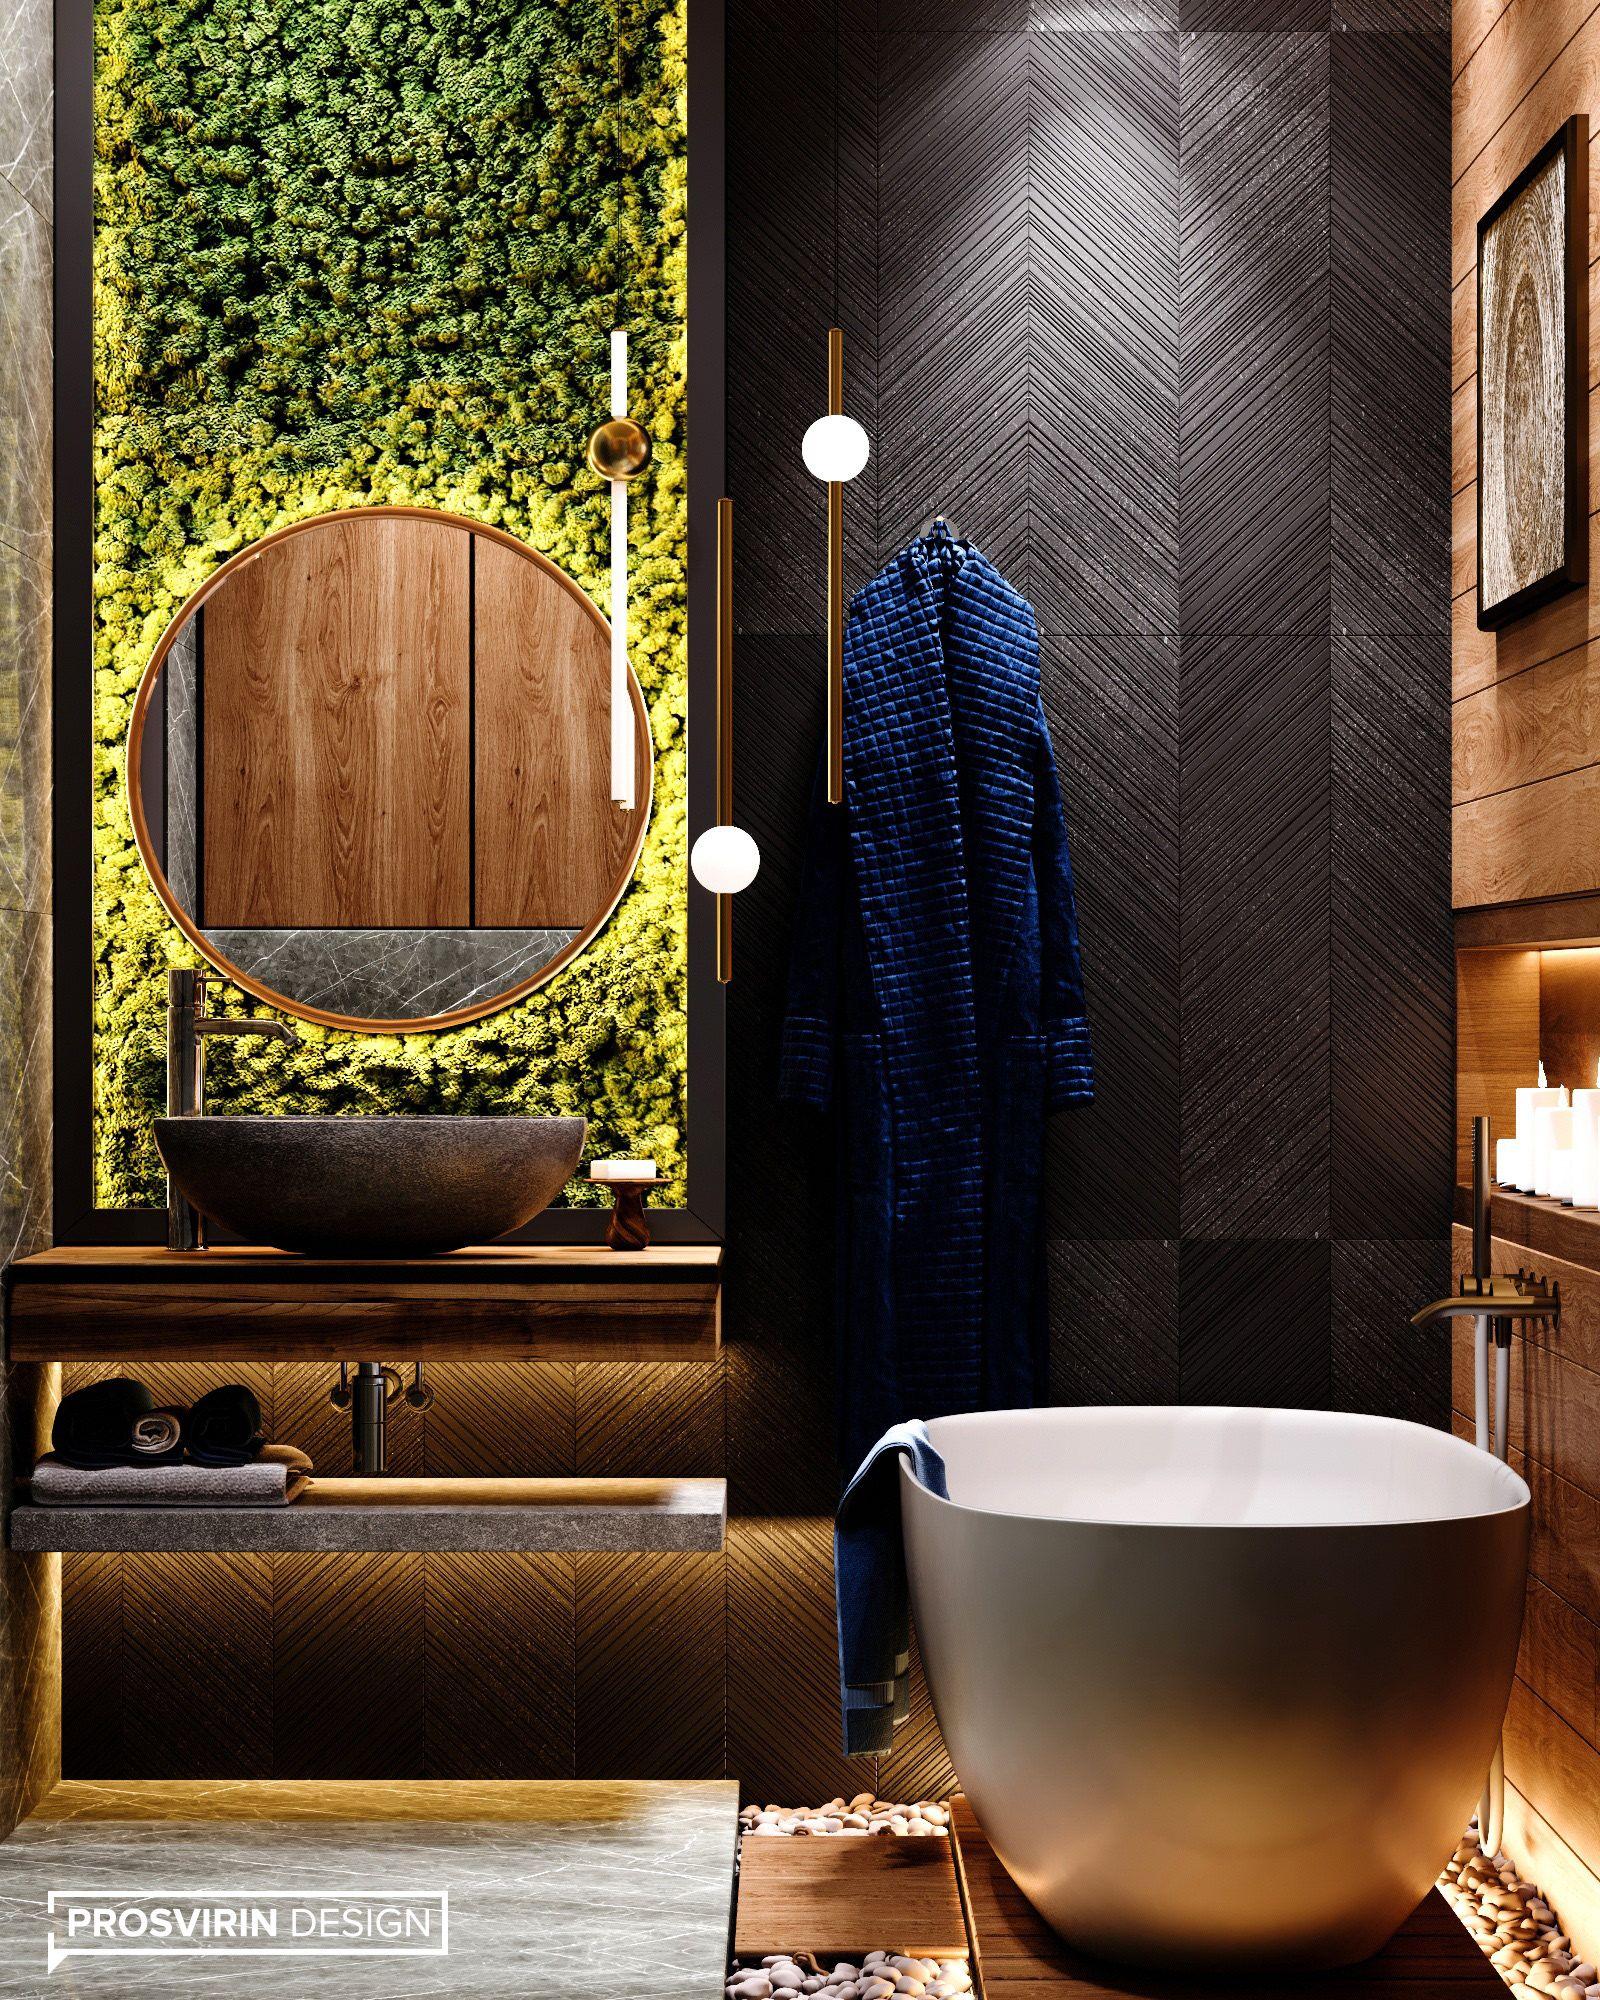 Greenery On Behance Best Bathroom Designs Bathroom Design Luxury Bathroom Interior Design Luxury hotel bathroom design